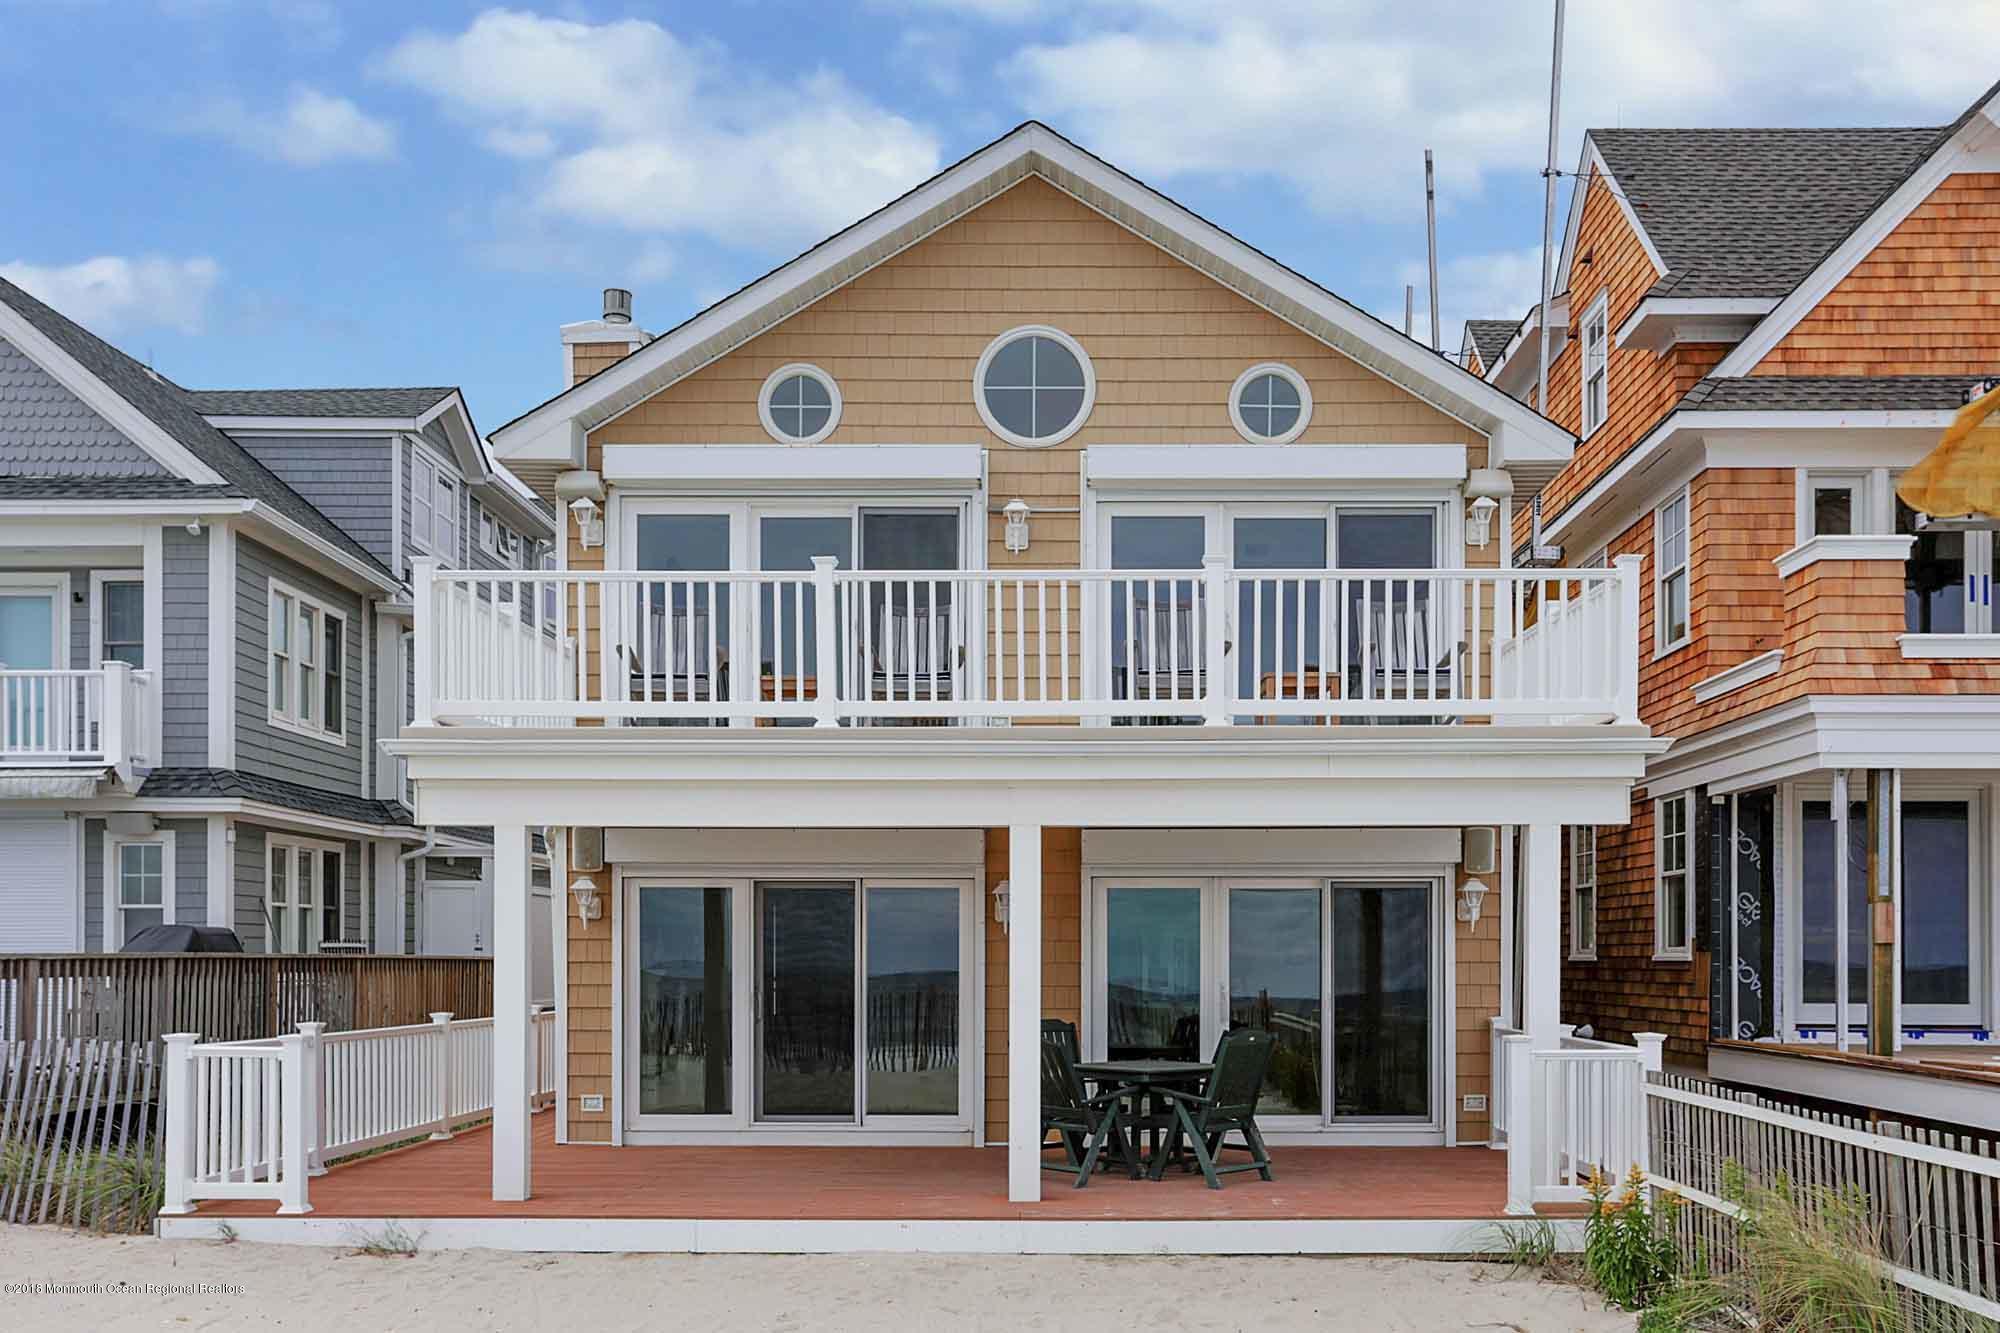 Photo of 3648 Ocean Terrace, Normandy Beach, NJ 08739